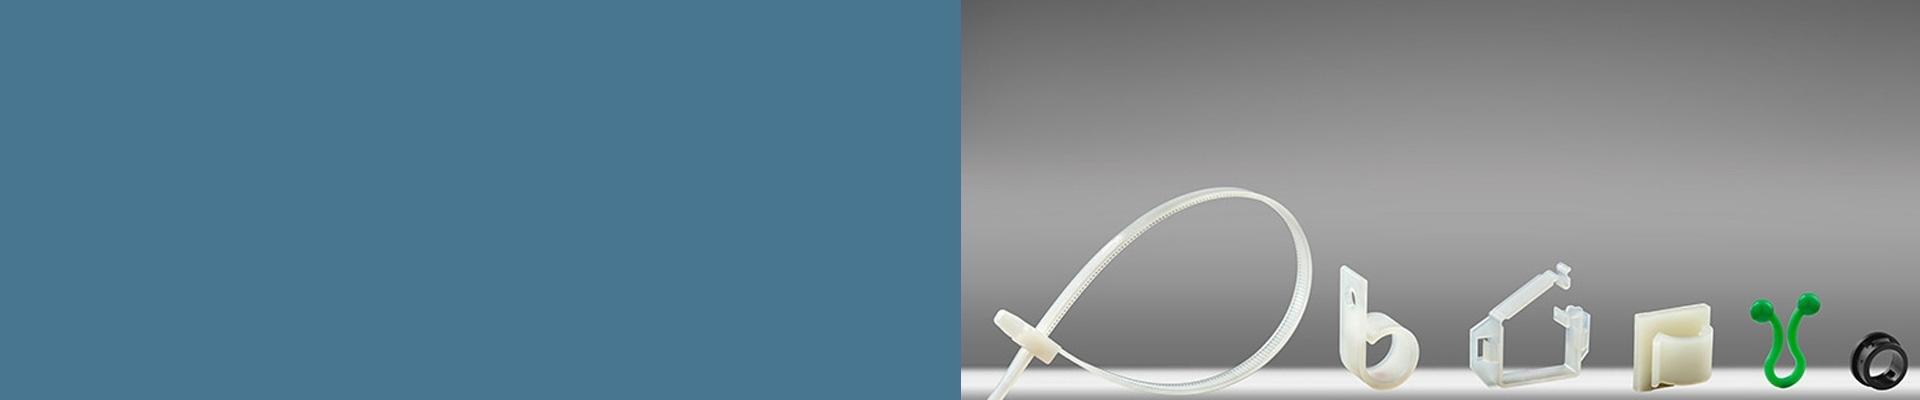 ✓ Kabelmanagement ✓ Kabelhalter ✓ Montagesockel in großer Auswahl